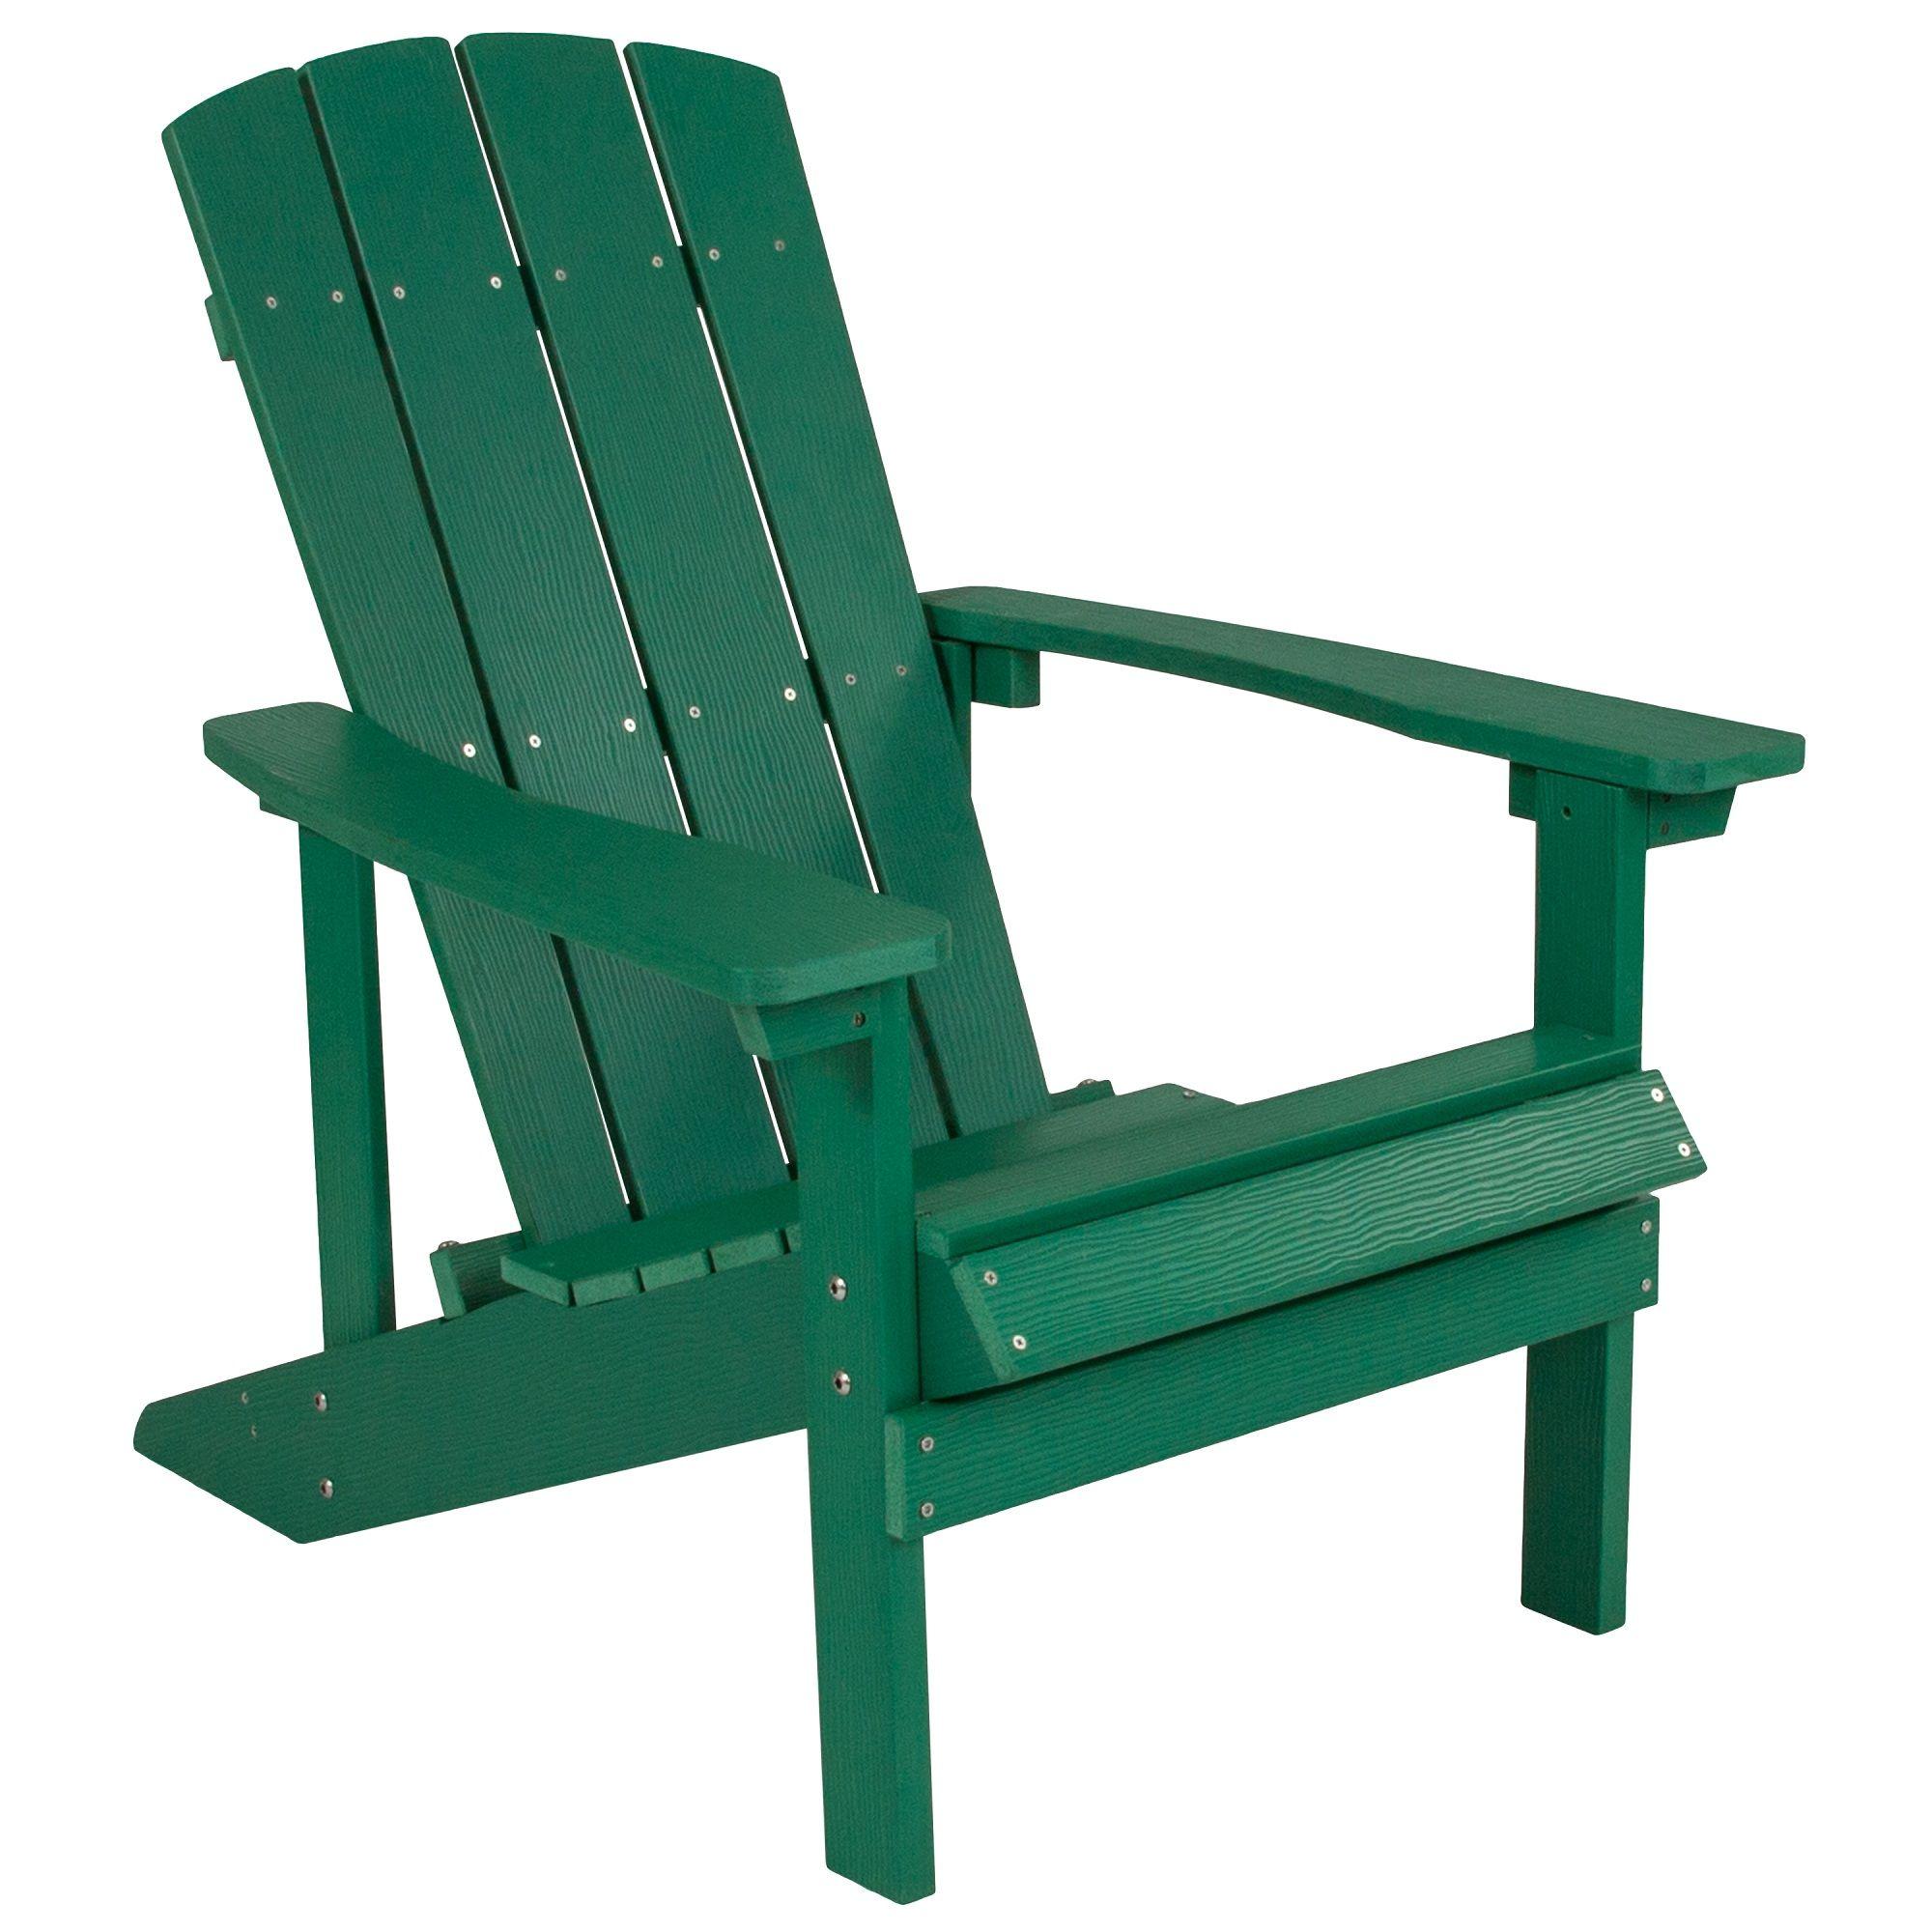 "35"" Green Faux Wood Charlestown AllWeather Adirondack"